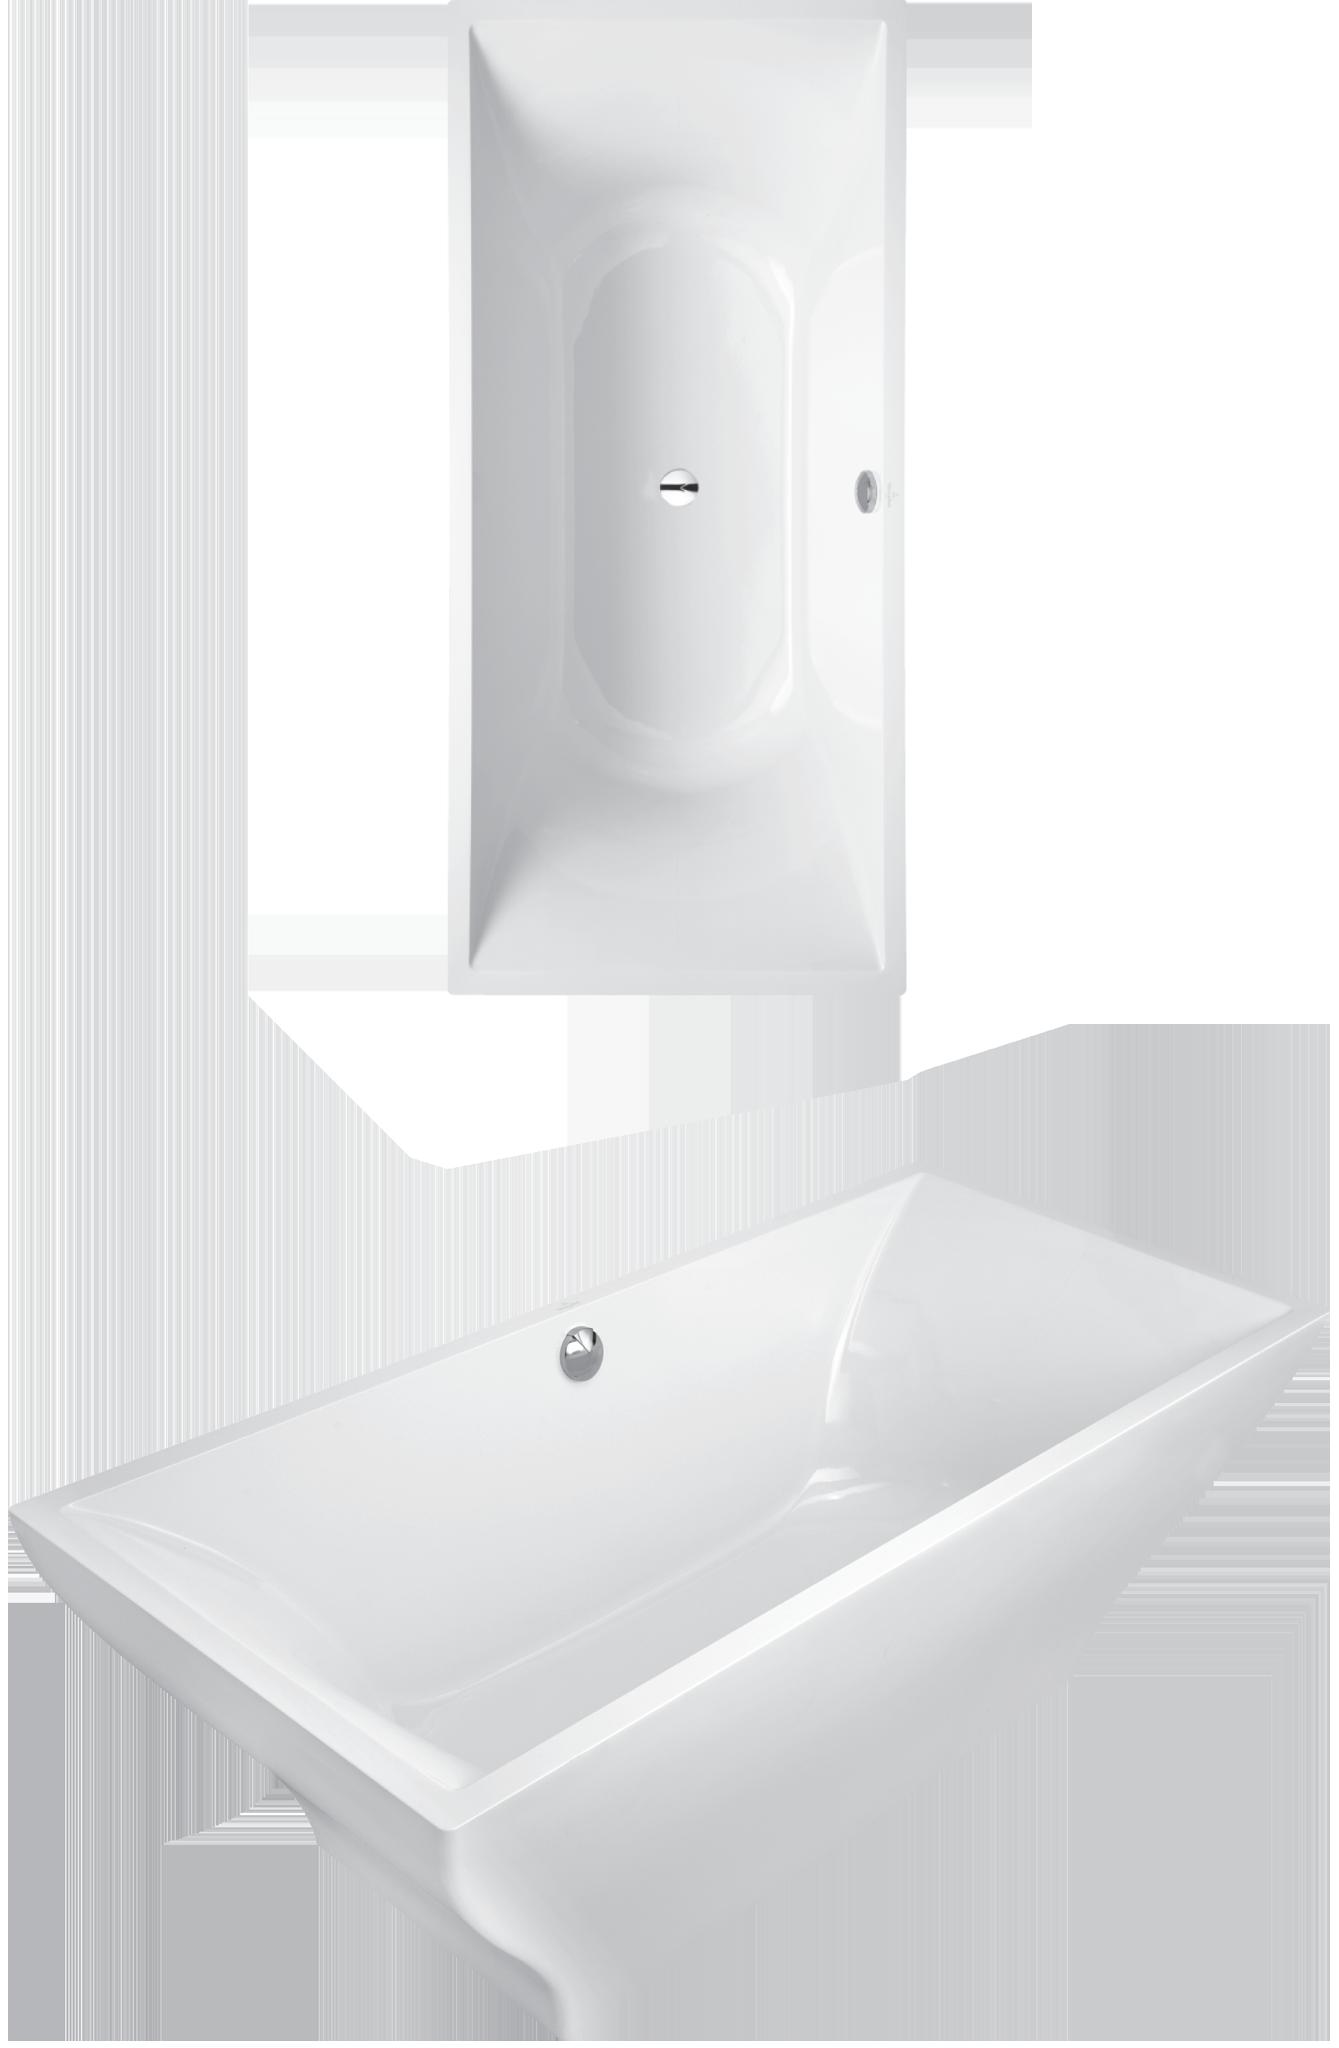 buy villeroy boch la belle free standing bath at accent bath for only 11. Black Bedroom Furniture Sets. Home Design Ideas